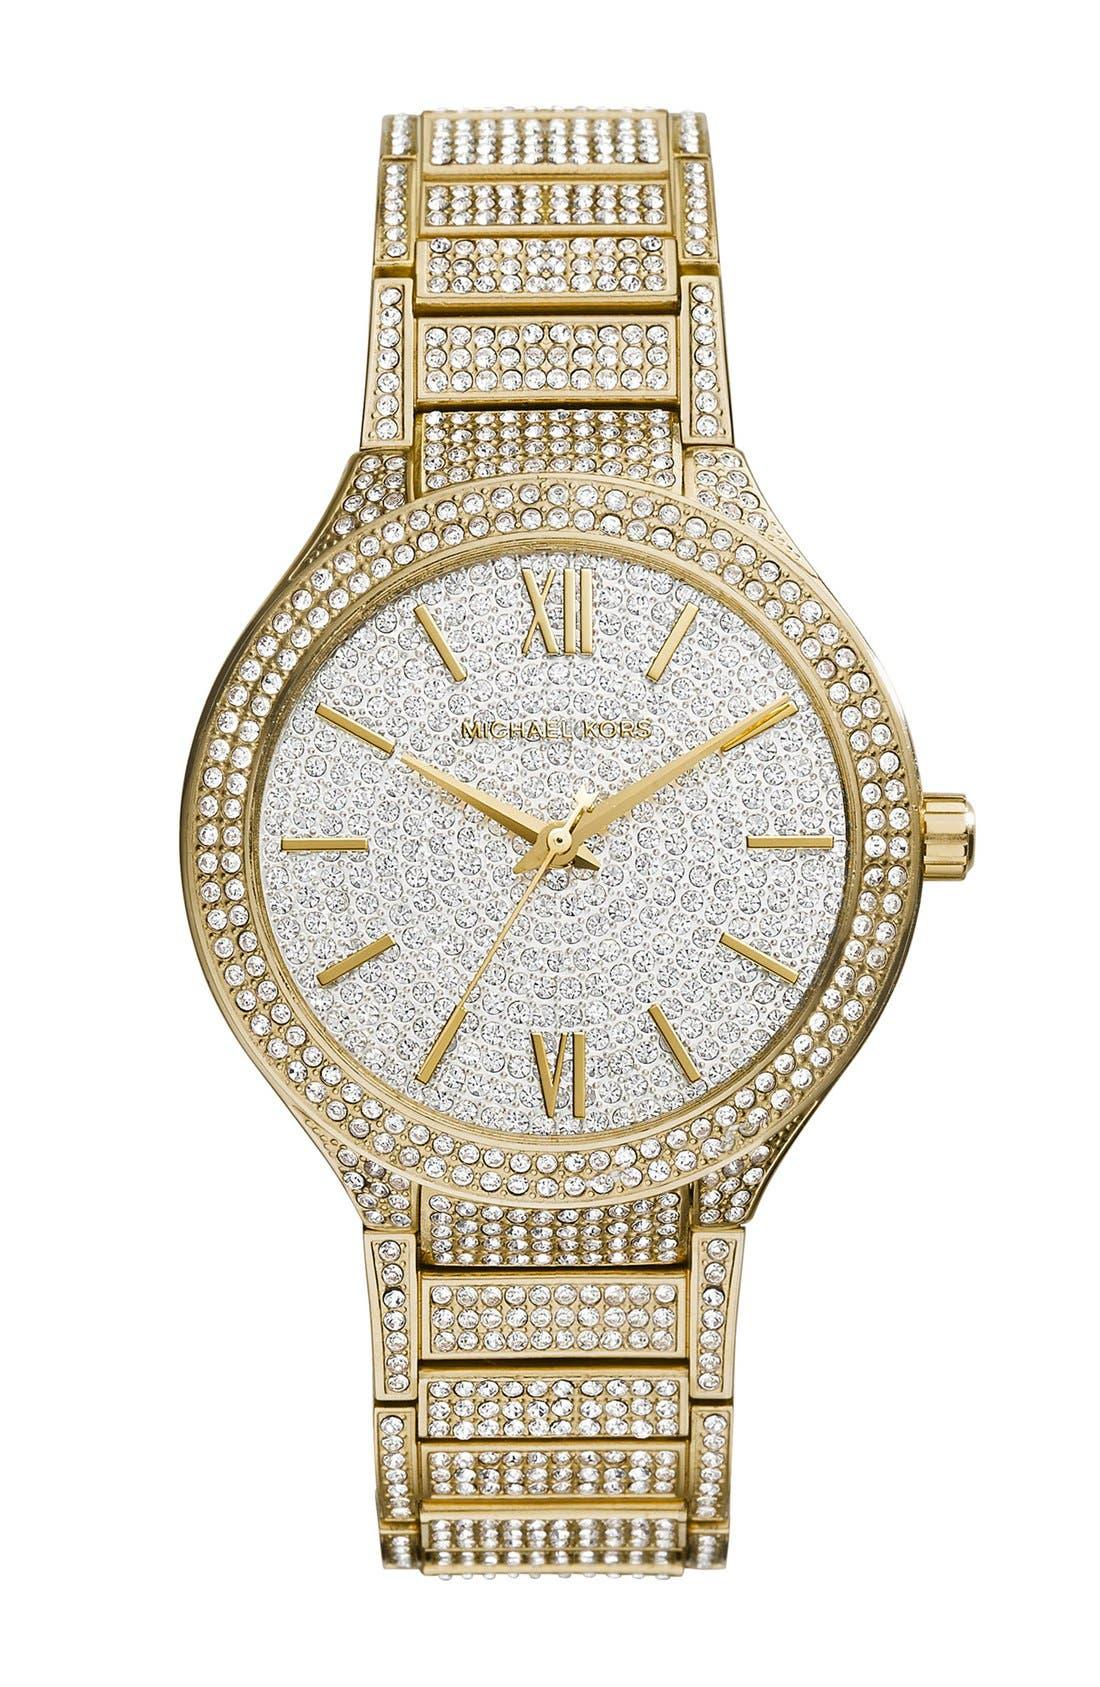 Main Image - Michael Kors 'Kerry' Pavé Round Bracelet Watch, 38mm